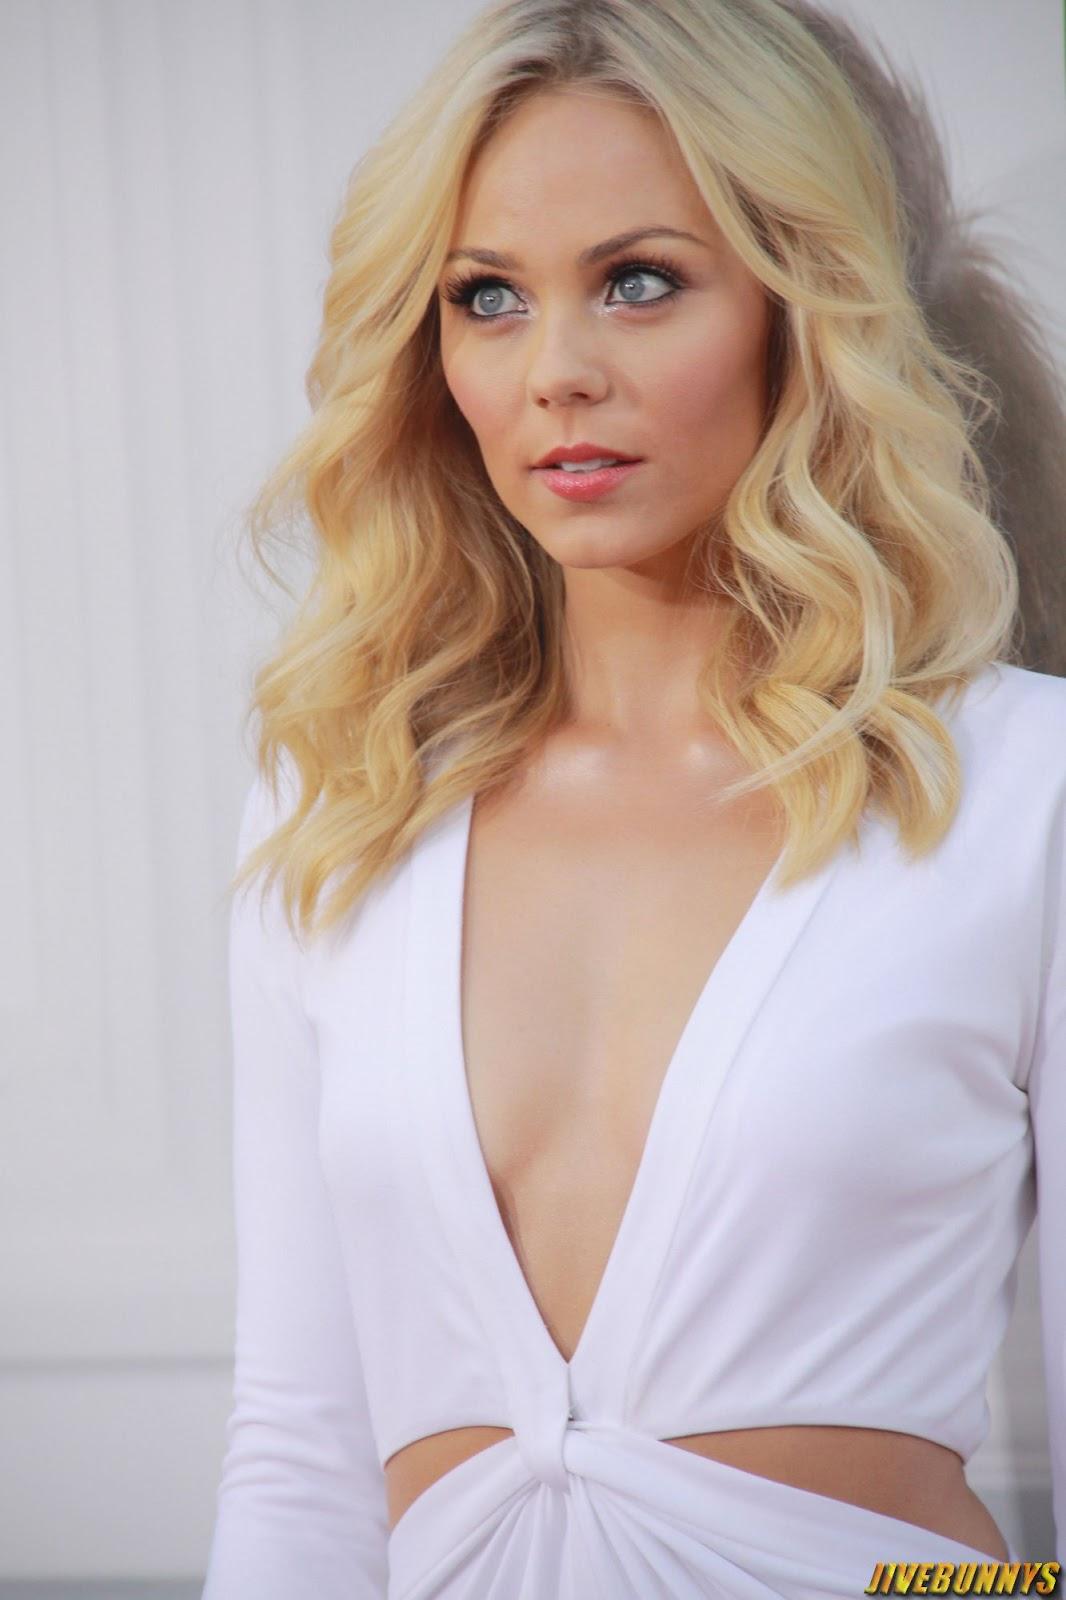 Sexy Blonde Actress 37